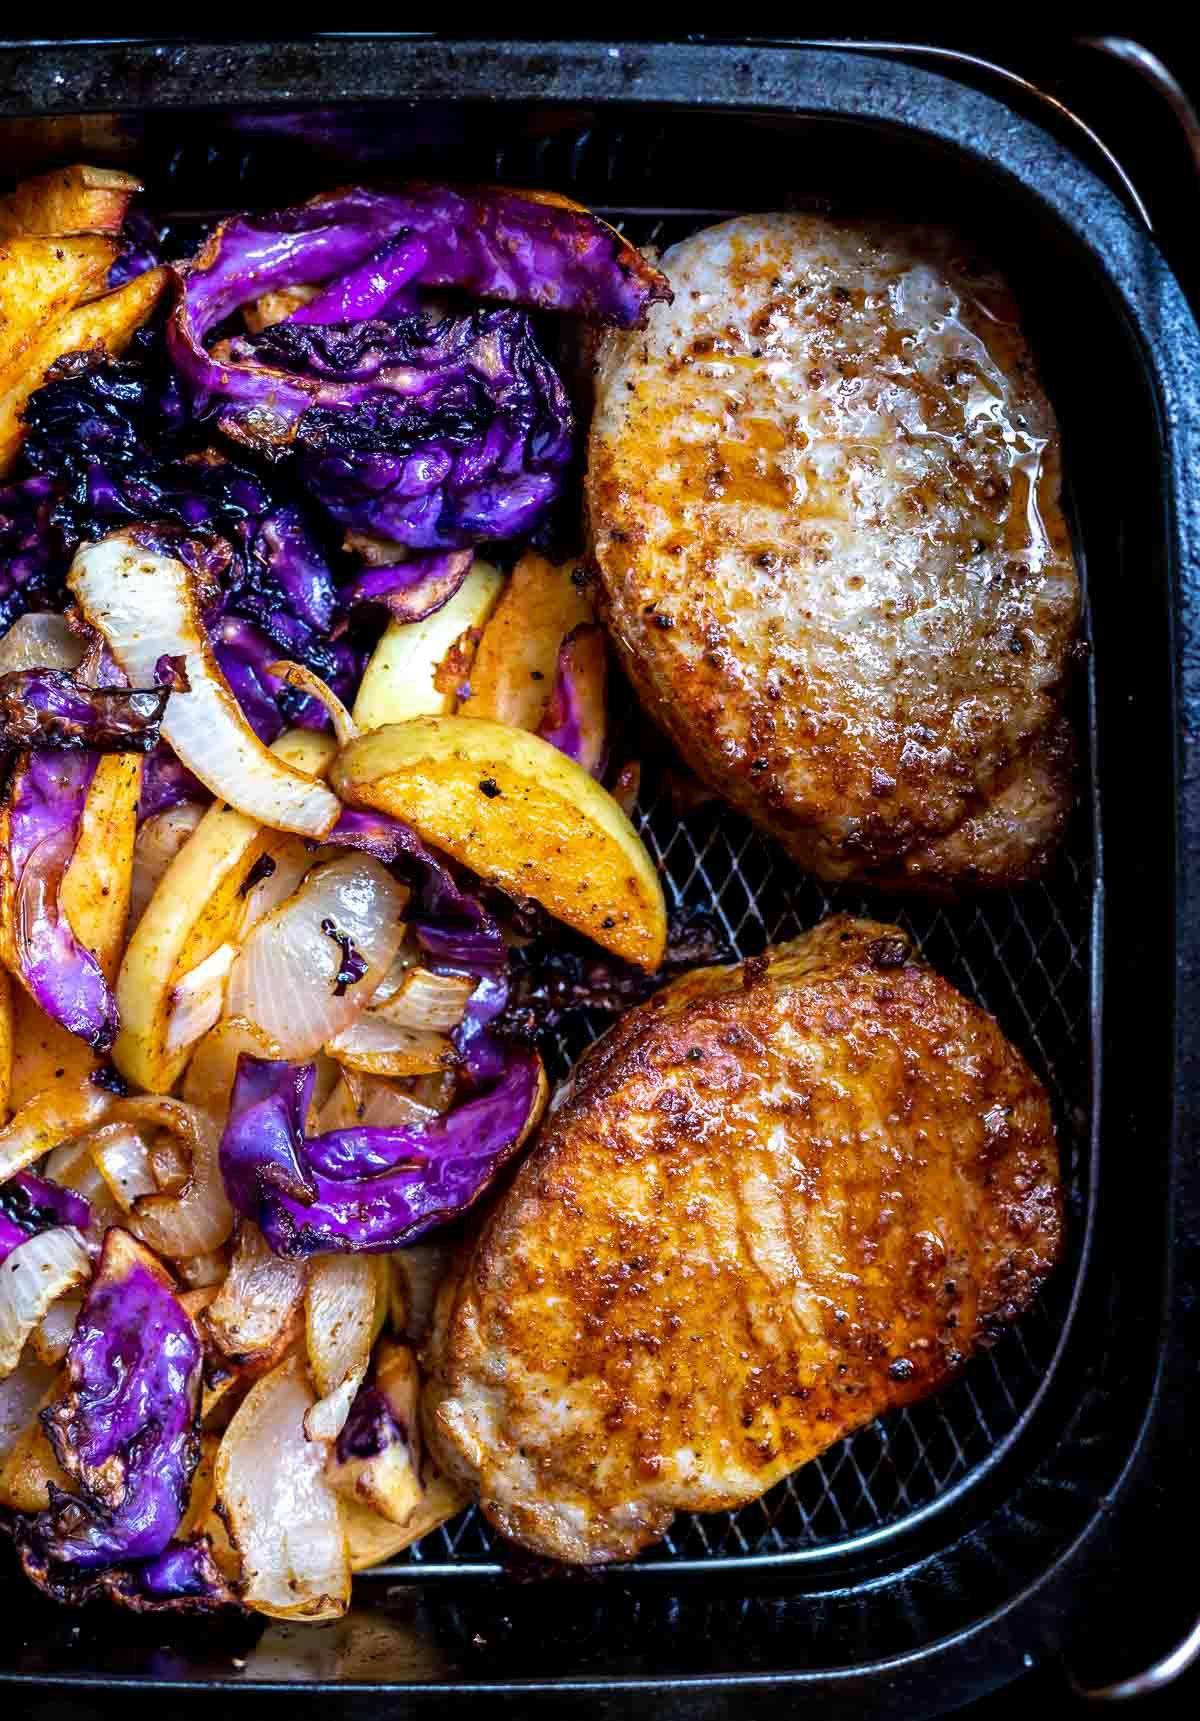 Air Fryer Pork Chops With Apples Recipe Air fryer